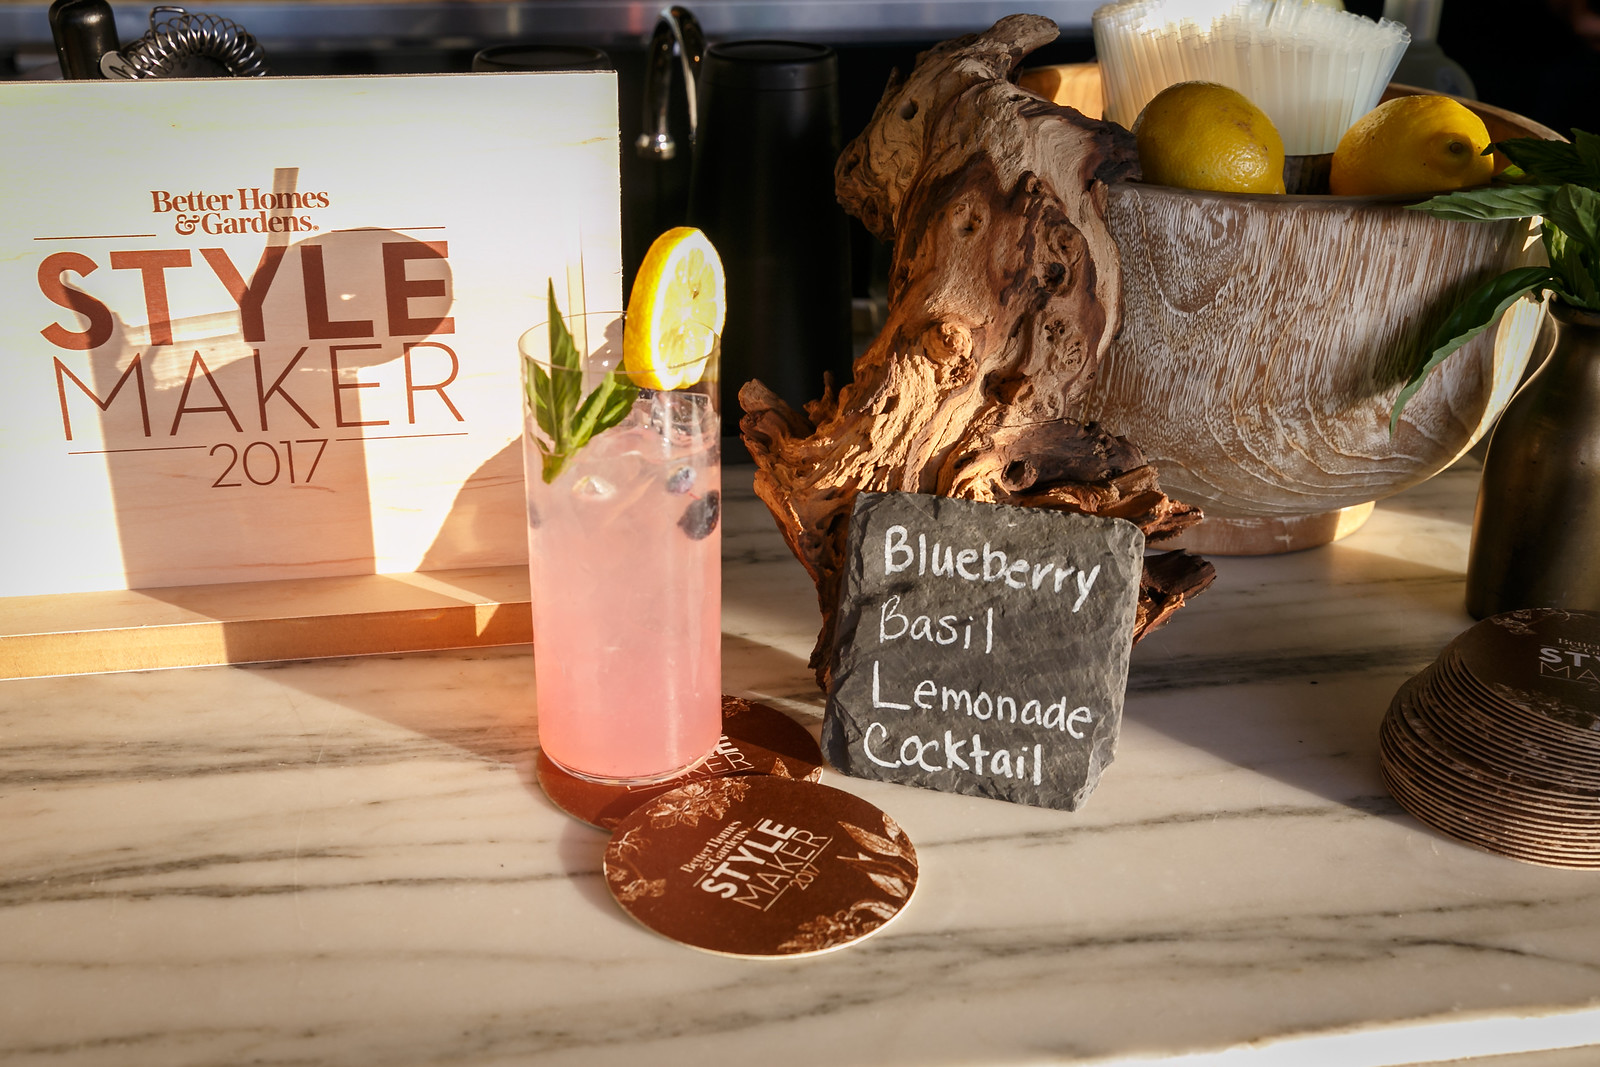 BHG Stylemaker cocktails kellyelko.com